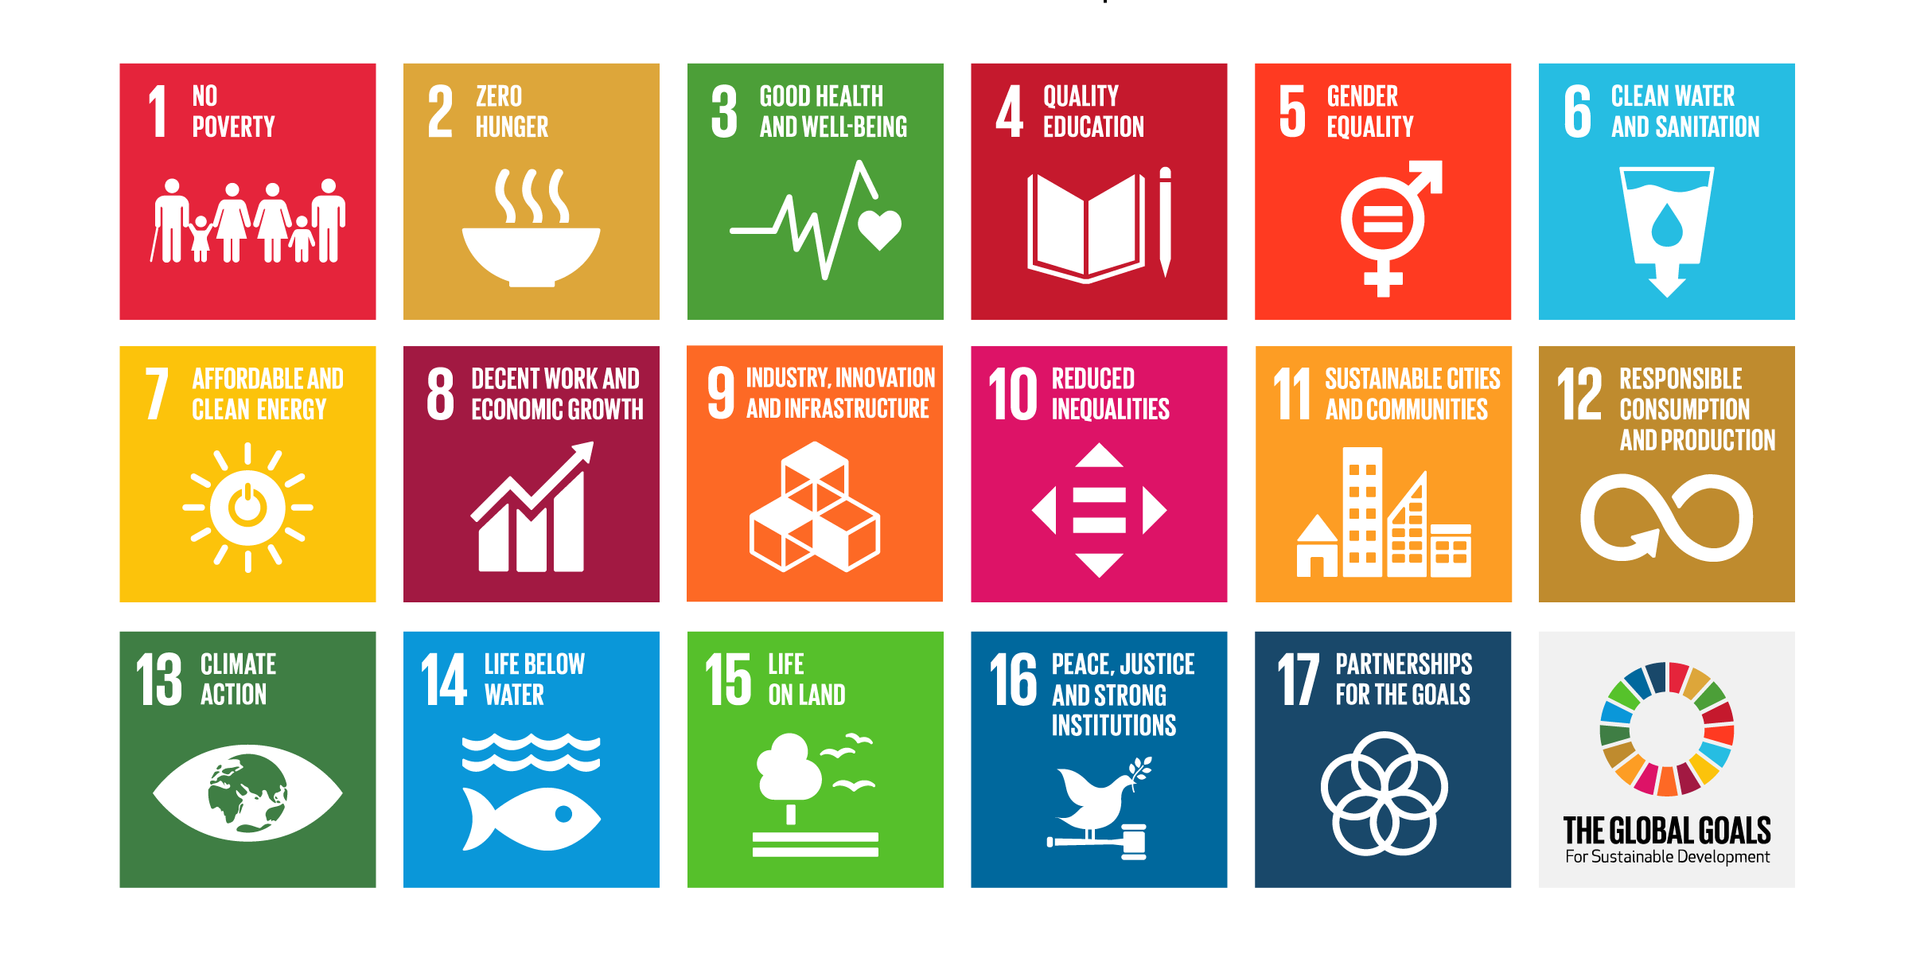 The Global Goals